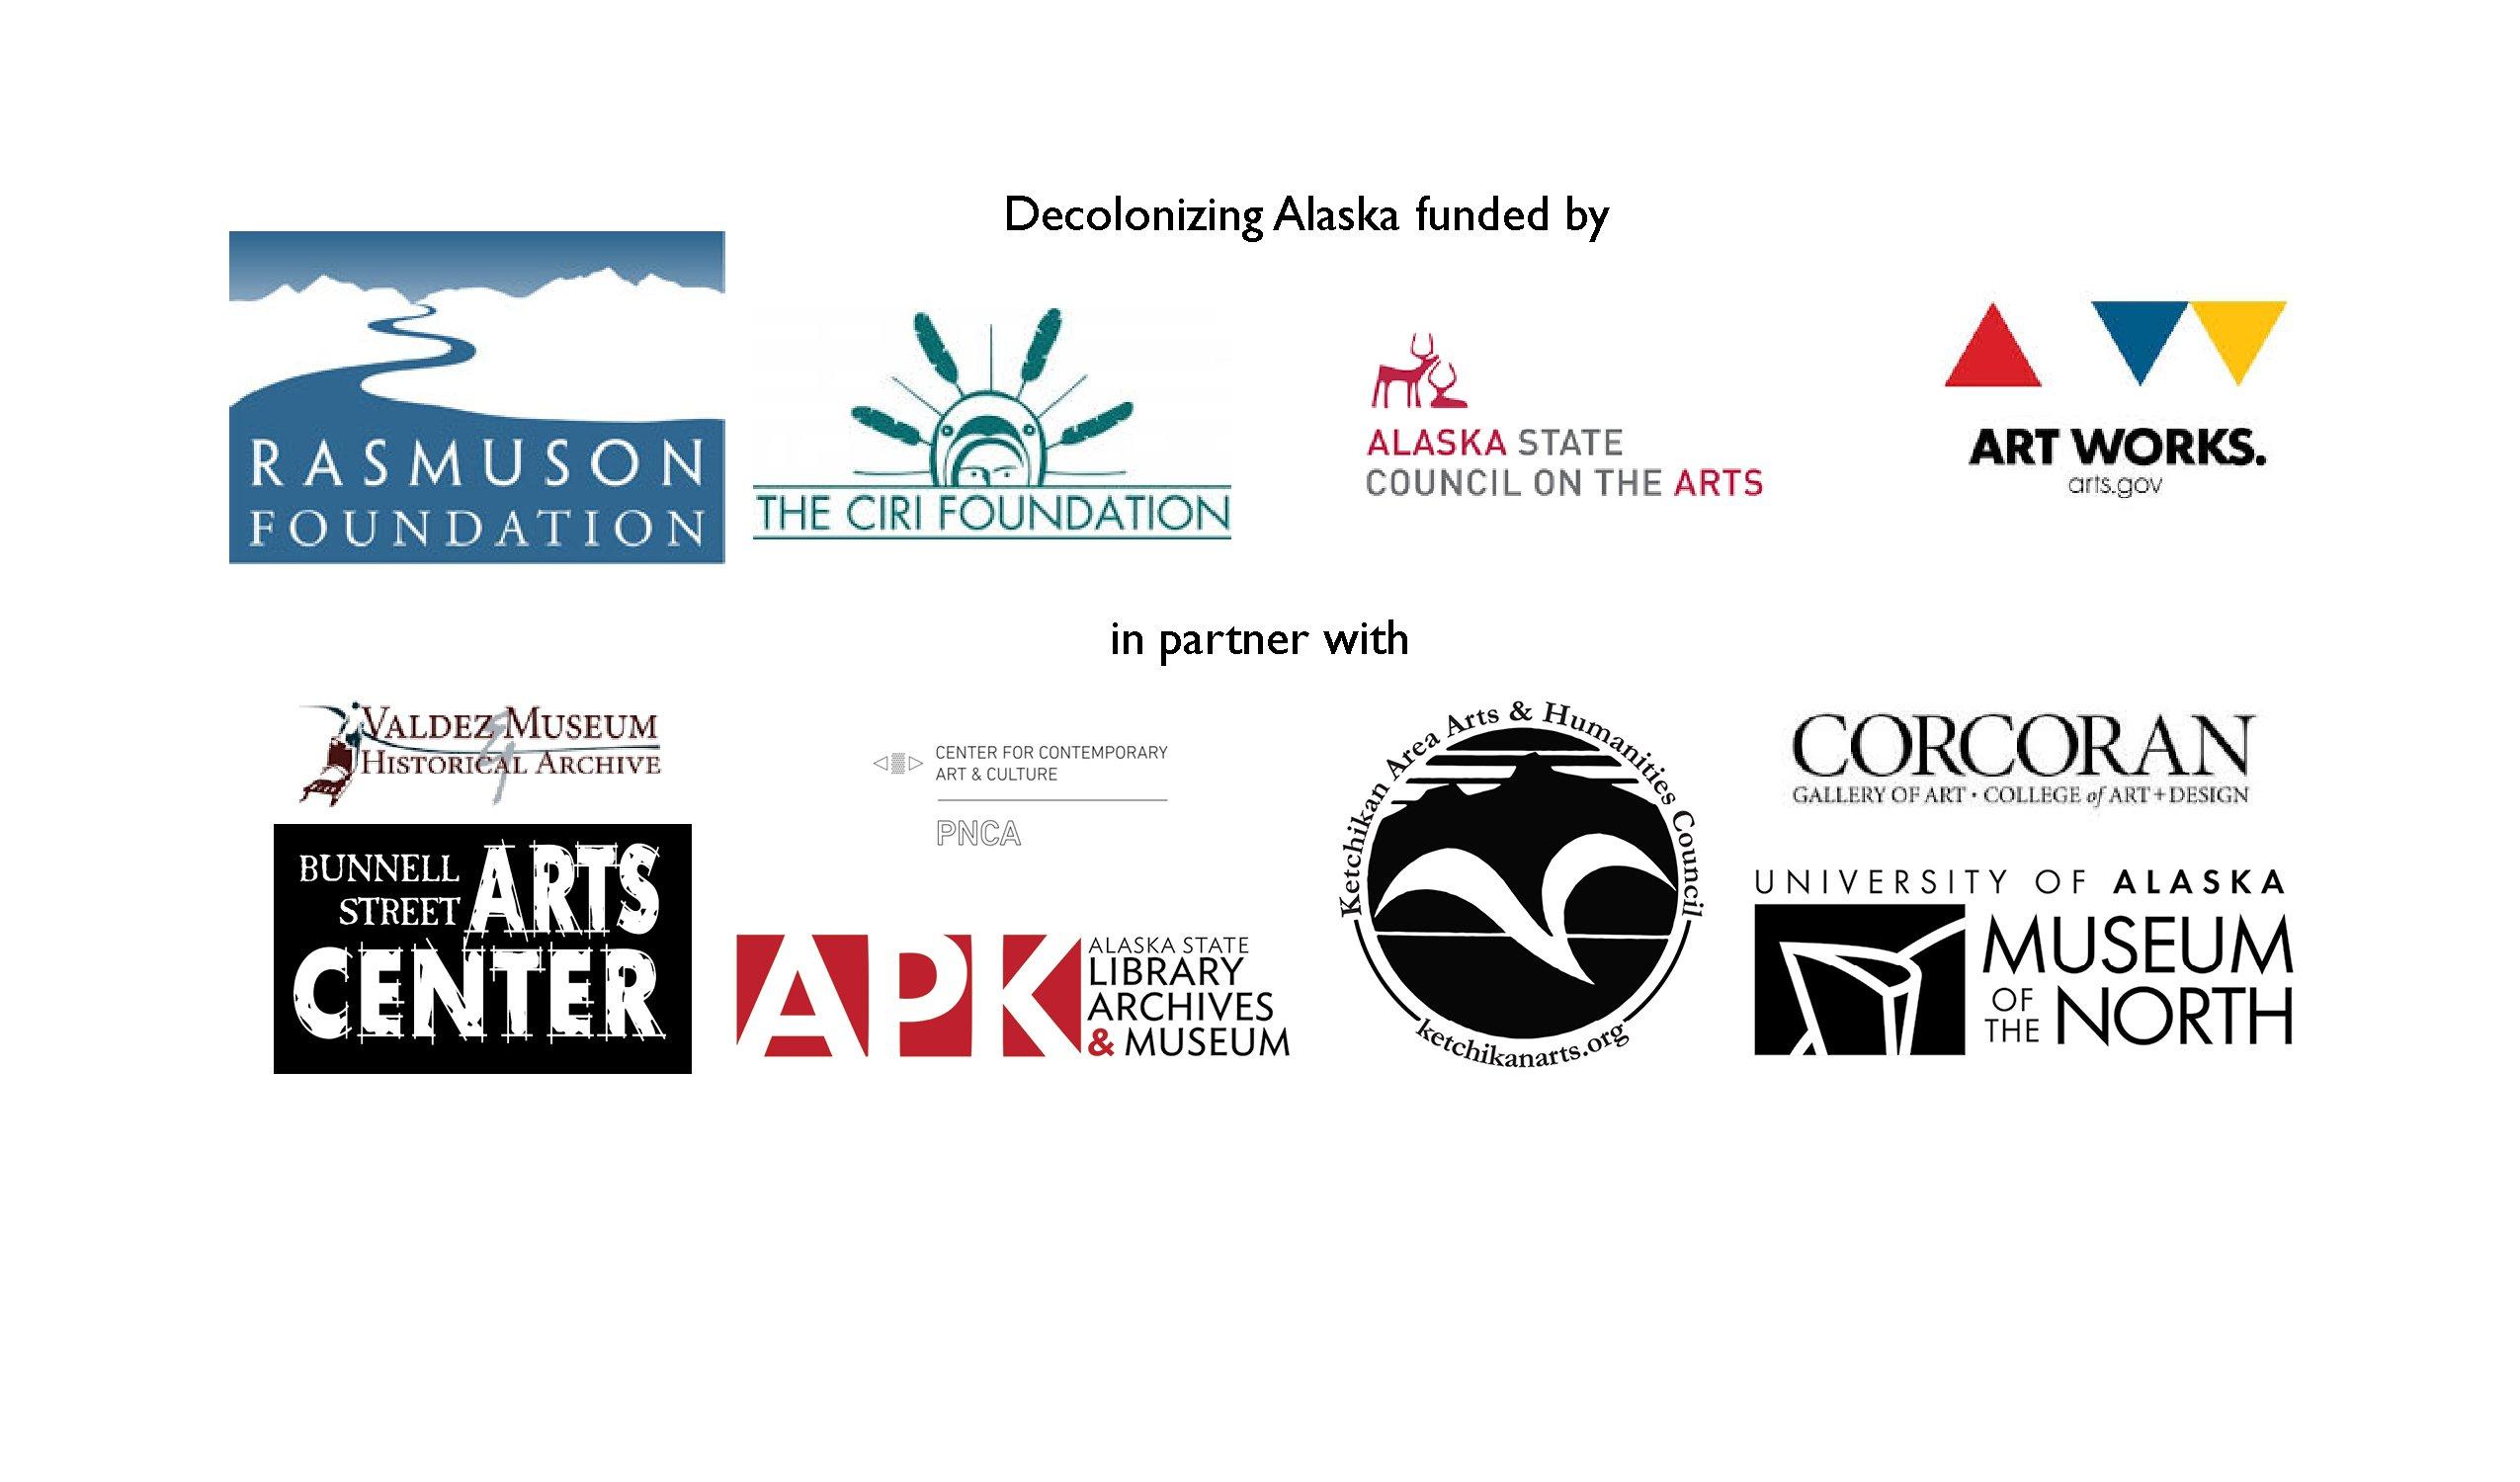 Decol_Funders_Partners_Logos